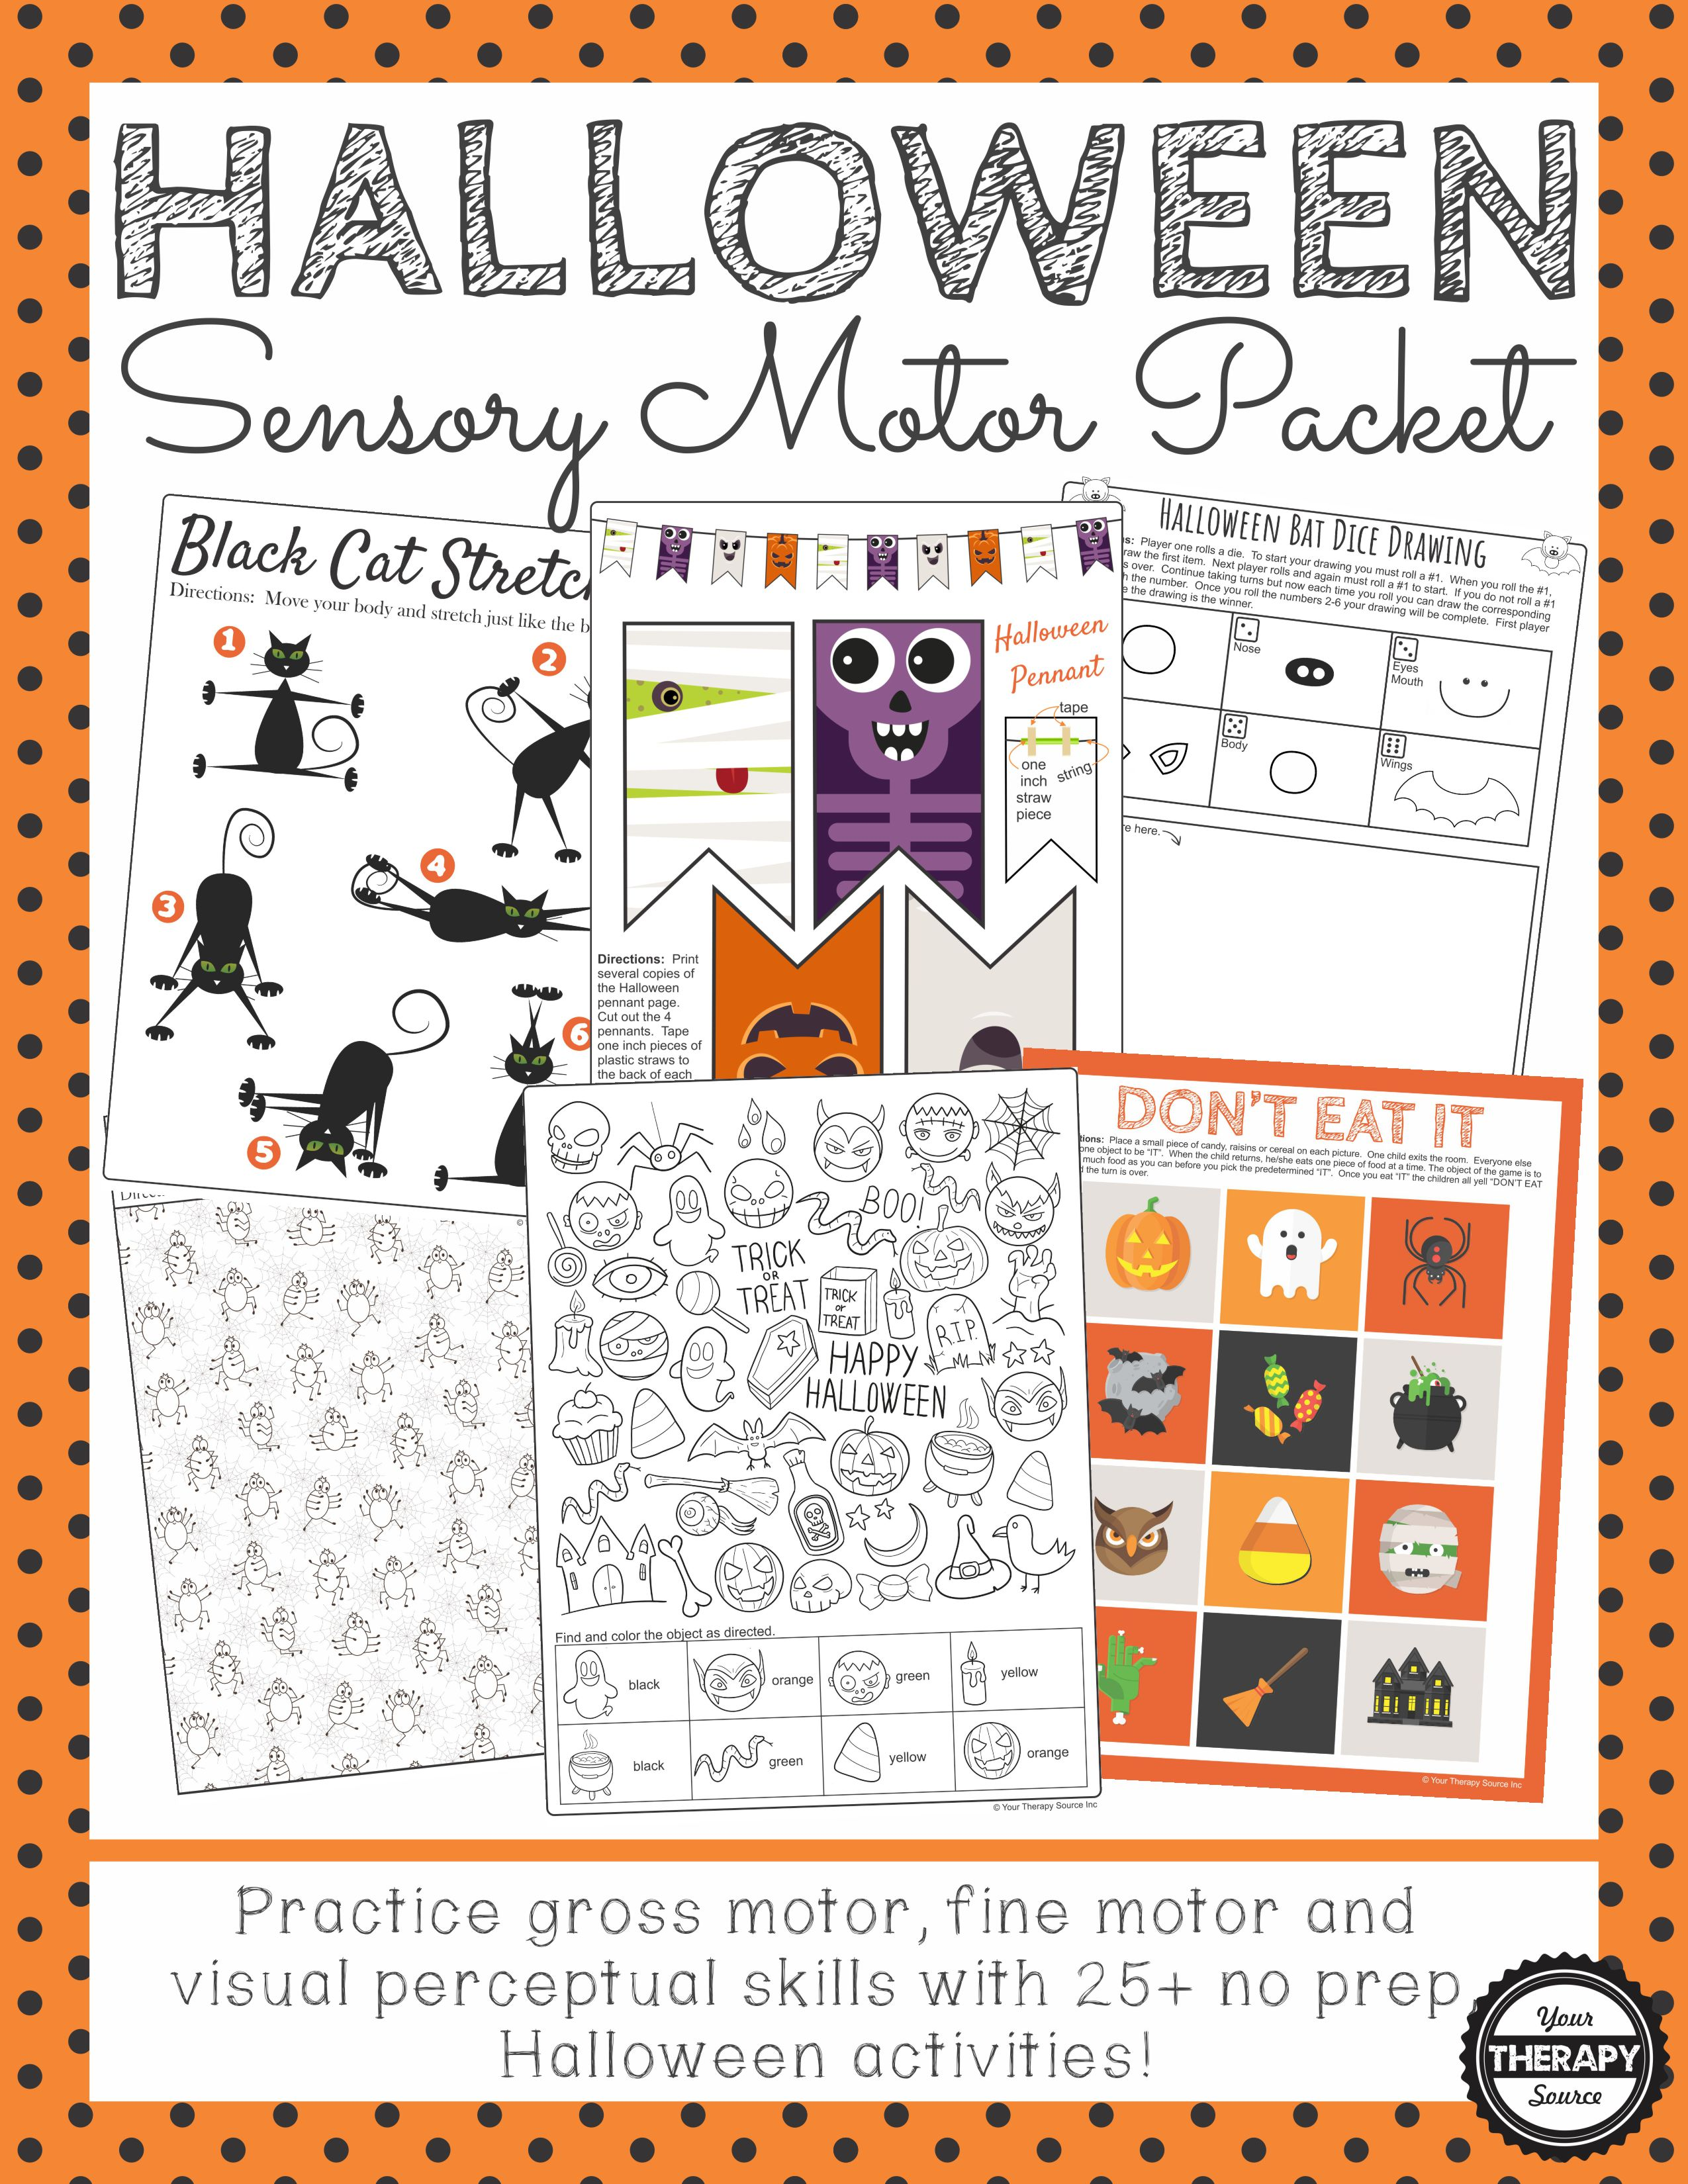 Halloween Sensory Motor Packet